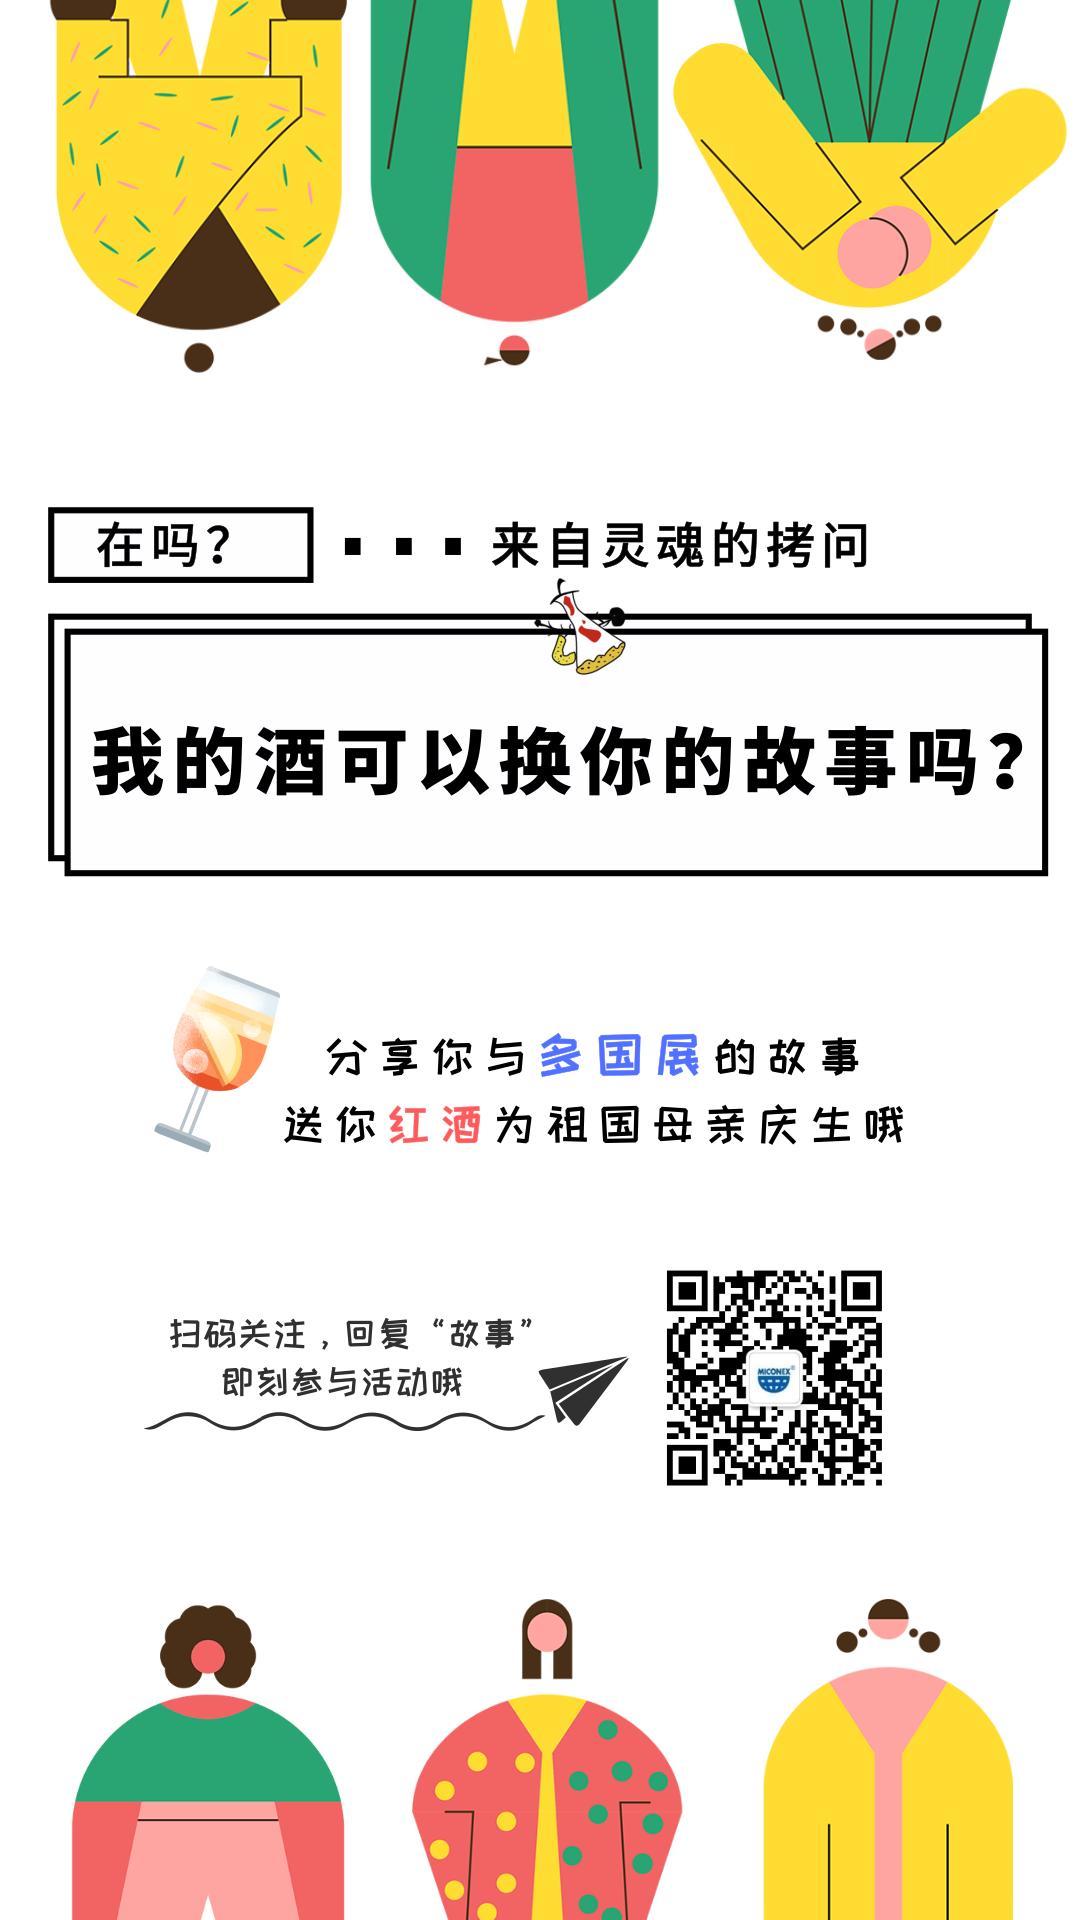 故事换红酒海报.png